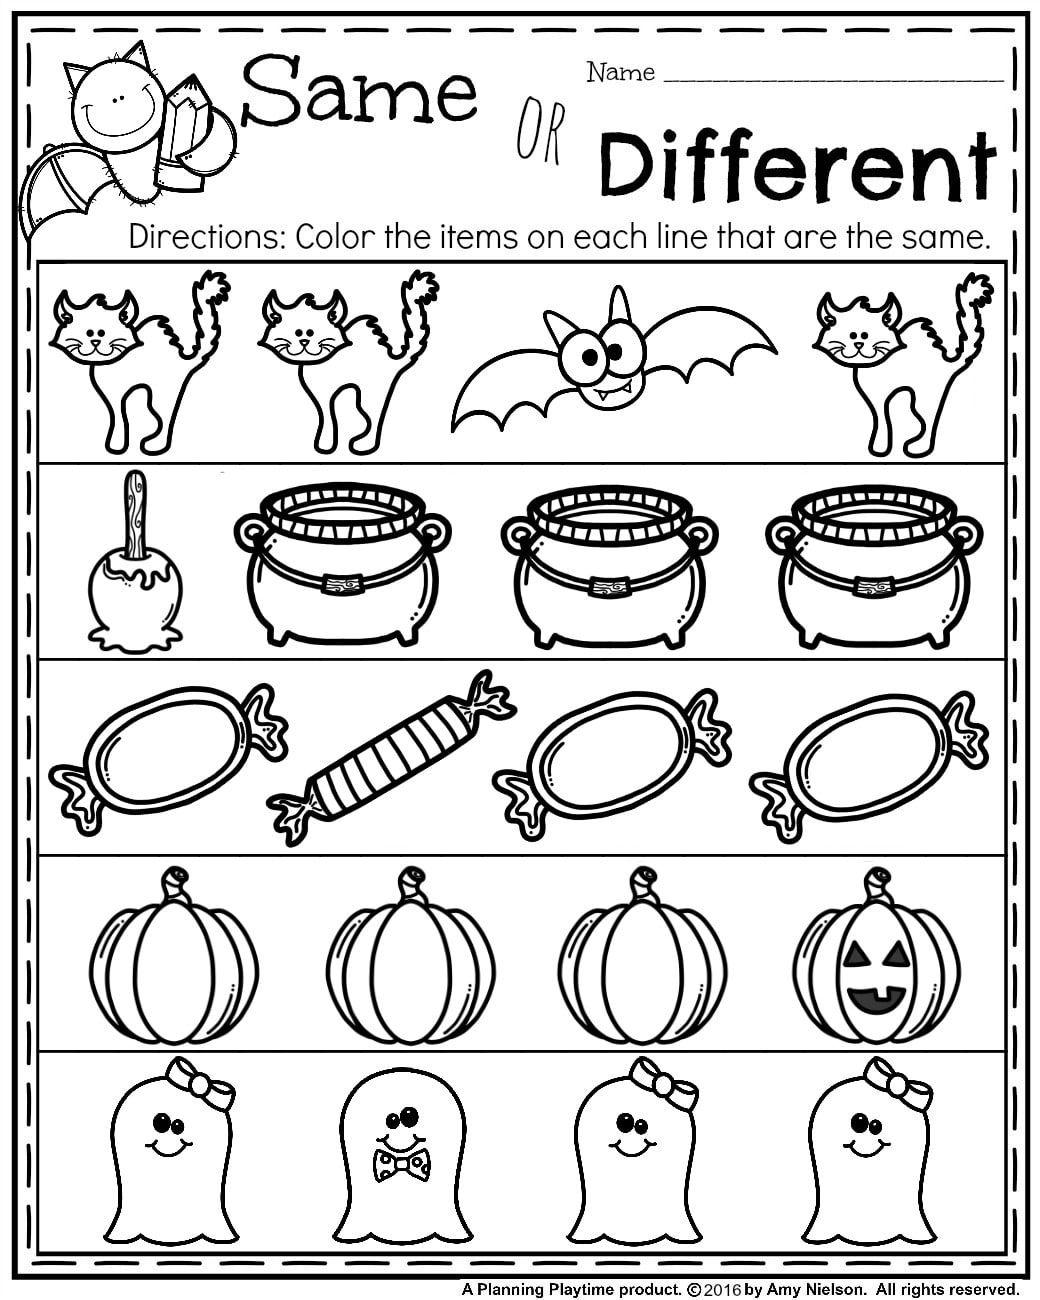 worksheet Same And Different Worksheets october preschool worksheets activities and school worksheets